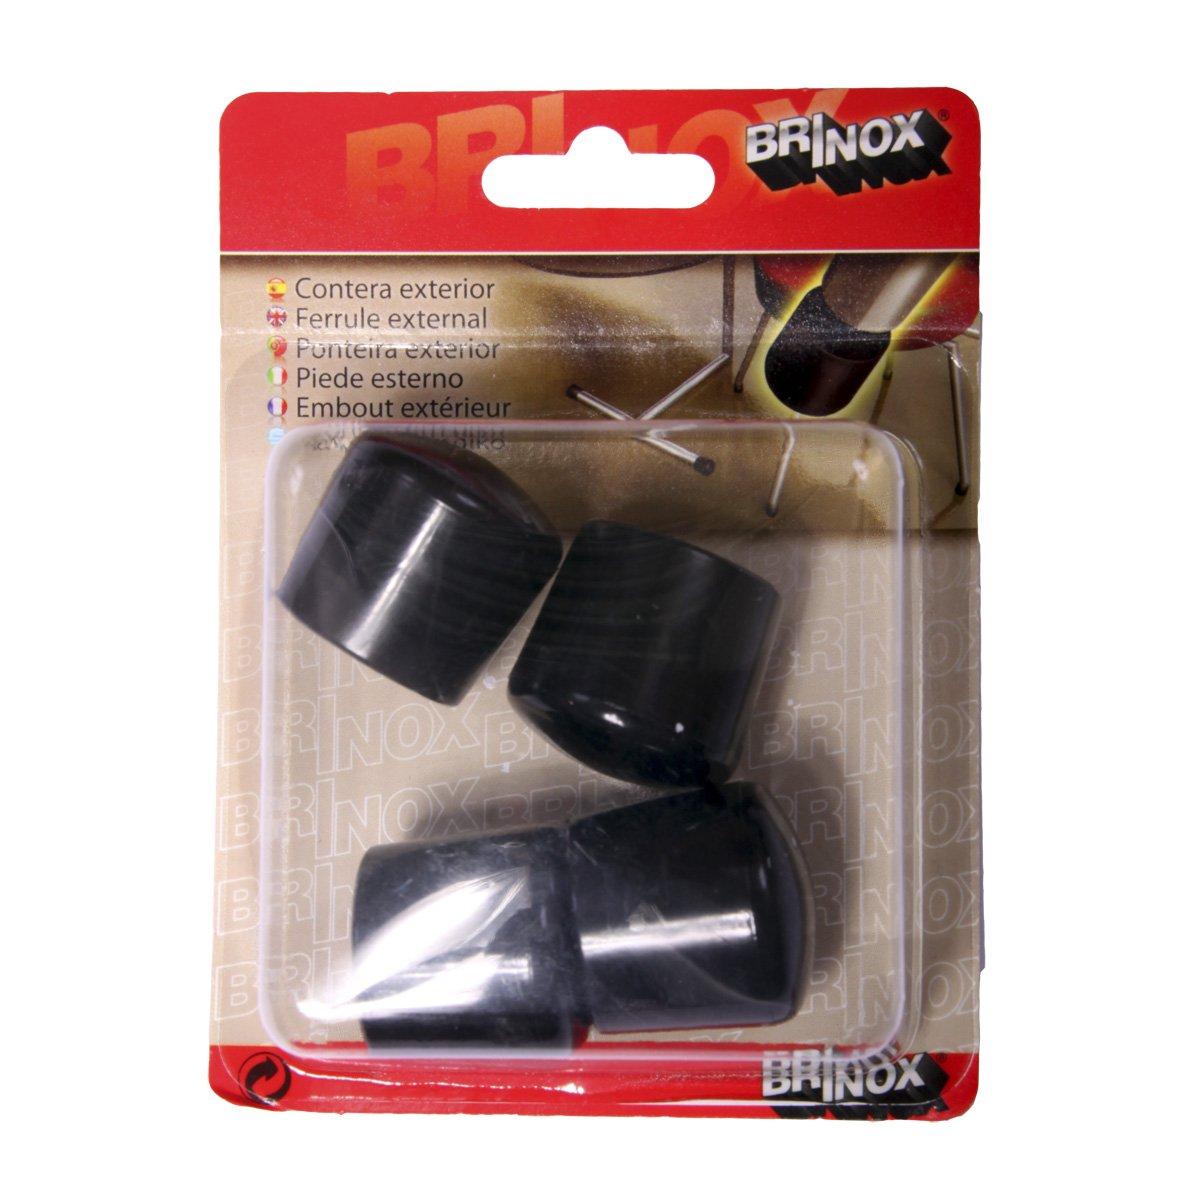 Negro Brinox B75295N Contera exterior redonda flexible Set de 50 Piezas Di/ámetro 28 mm